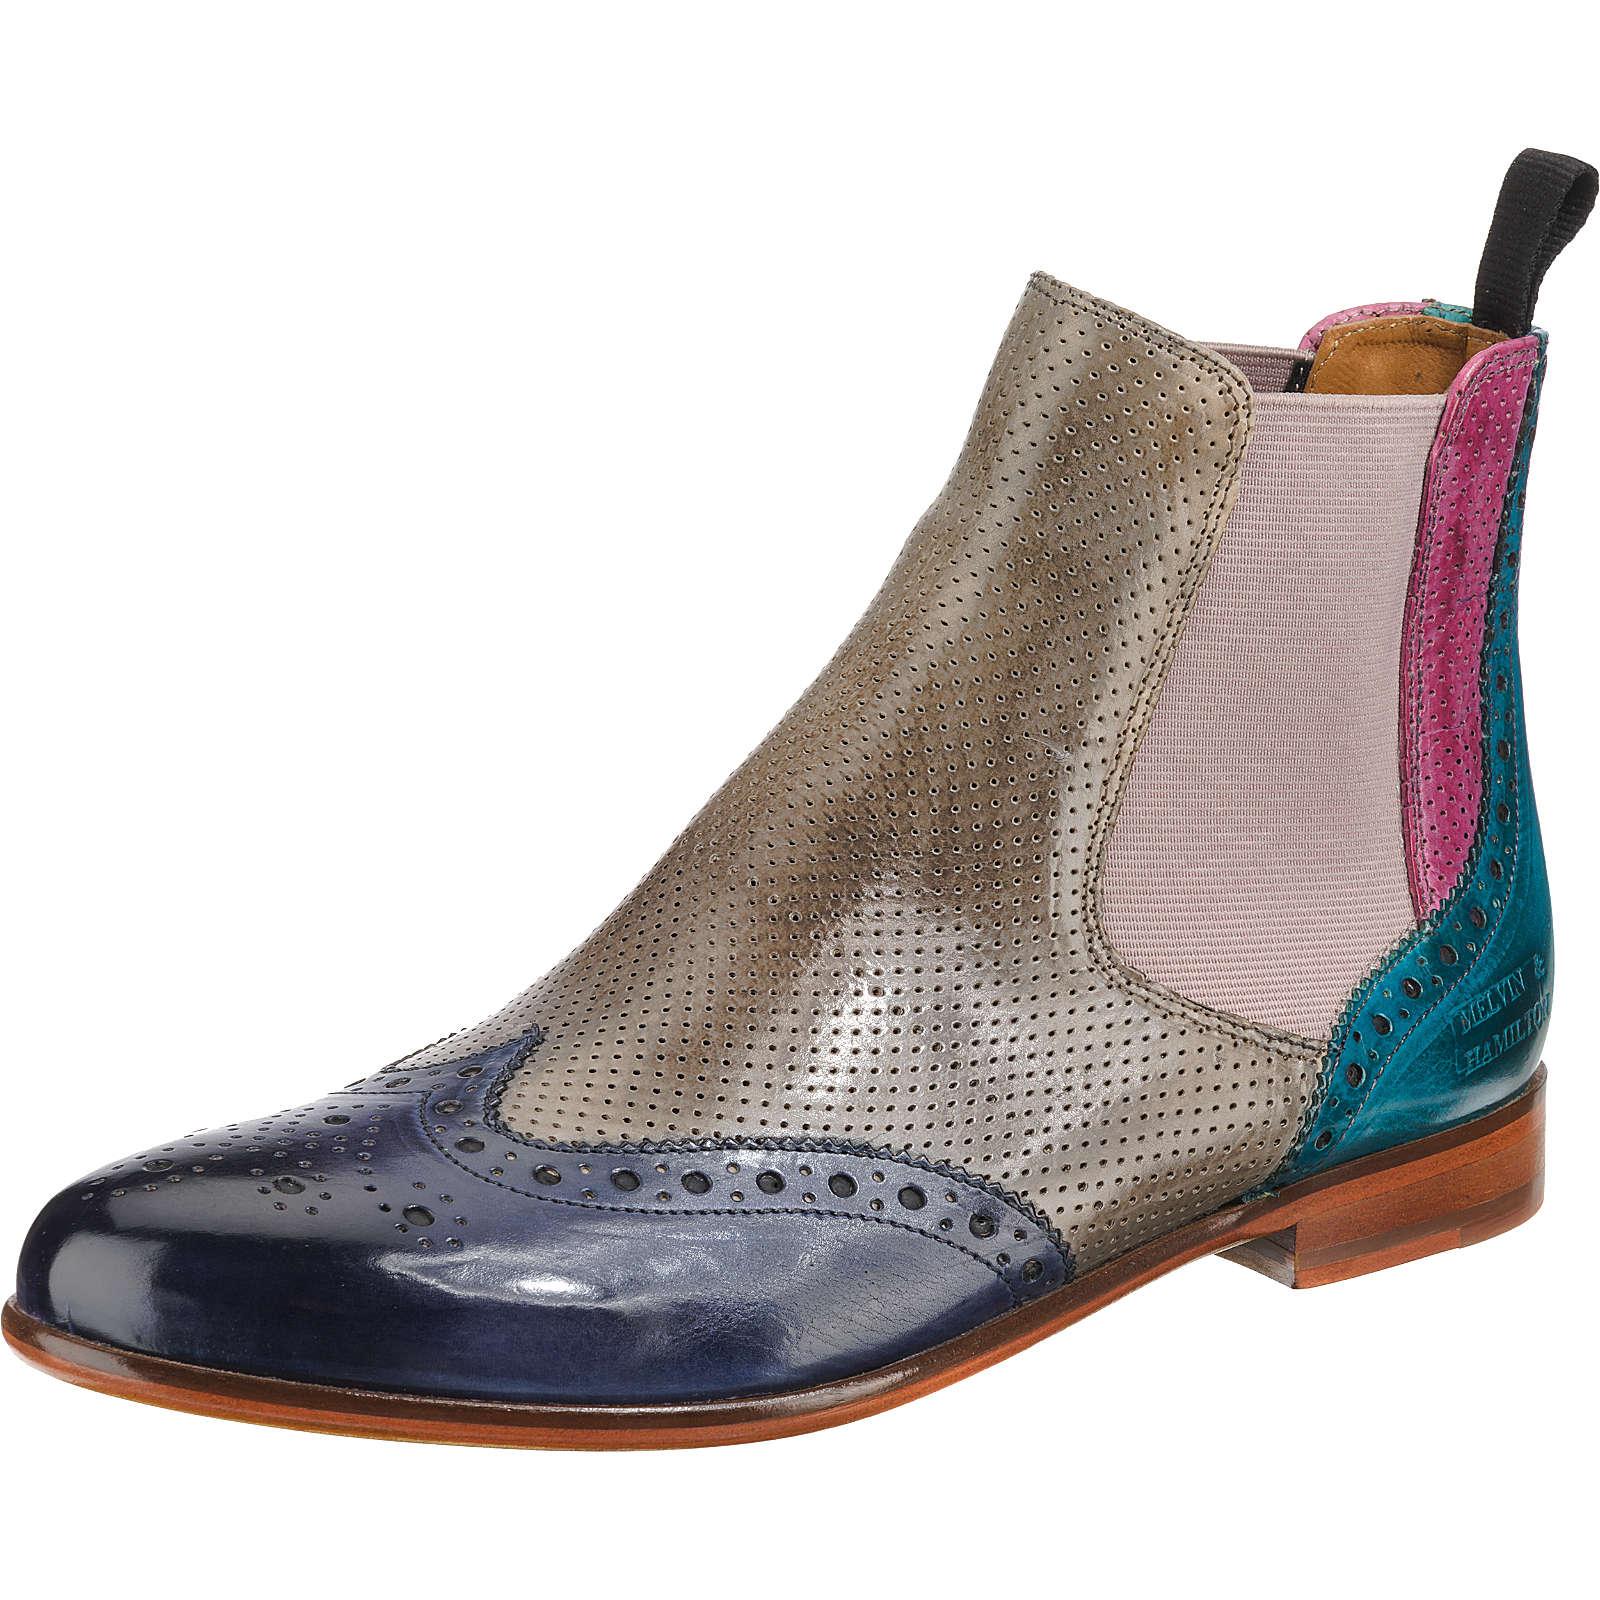 MELVIN & HAMILTON Chelsea Boots mehrfarbig Damen Gr. 42